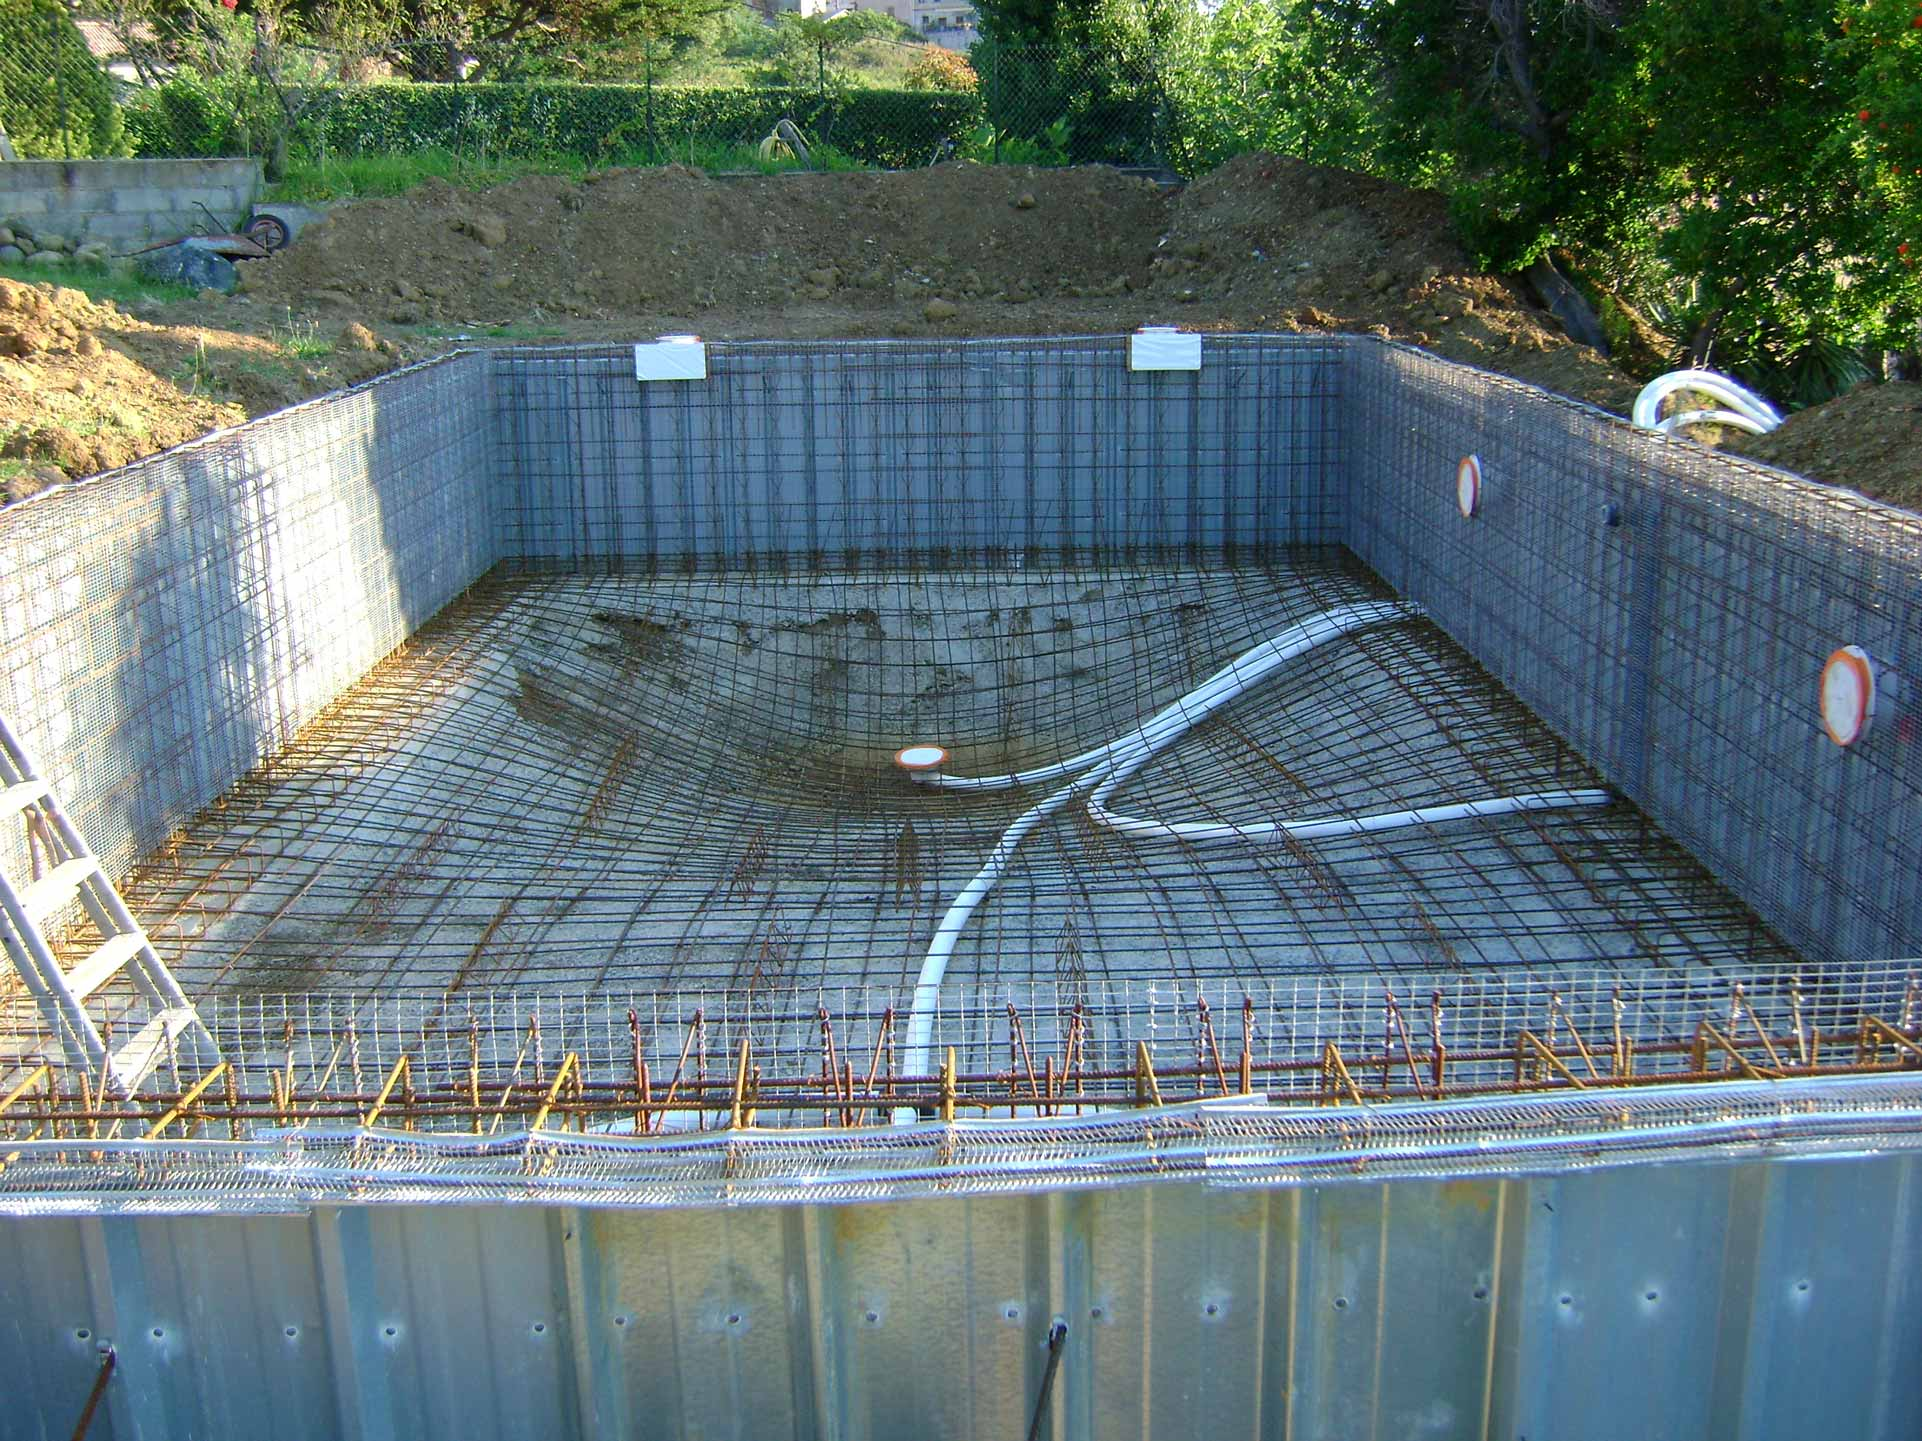 Piscines b ton corse corse piscines concept for Constructeur de piscine en beton